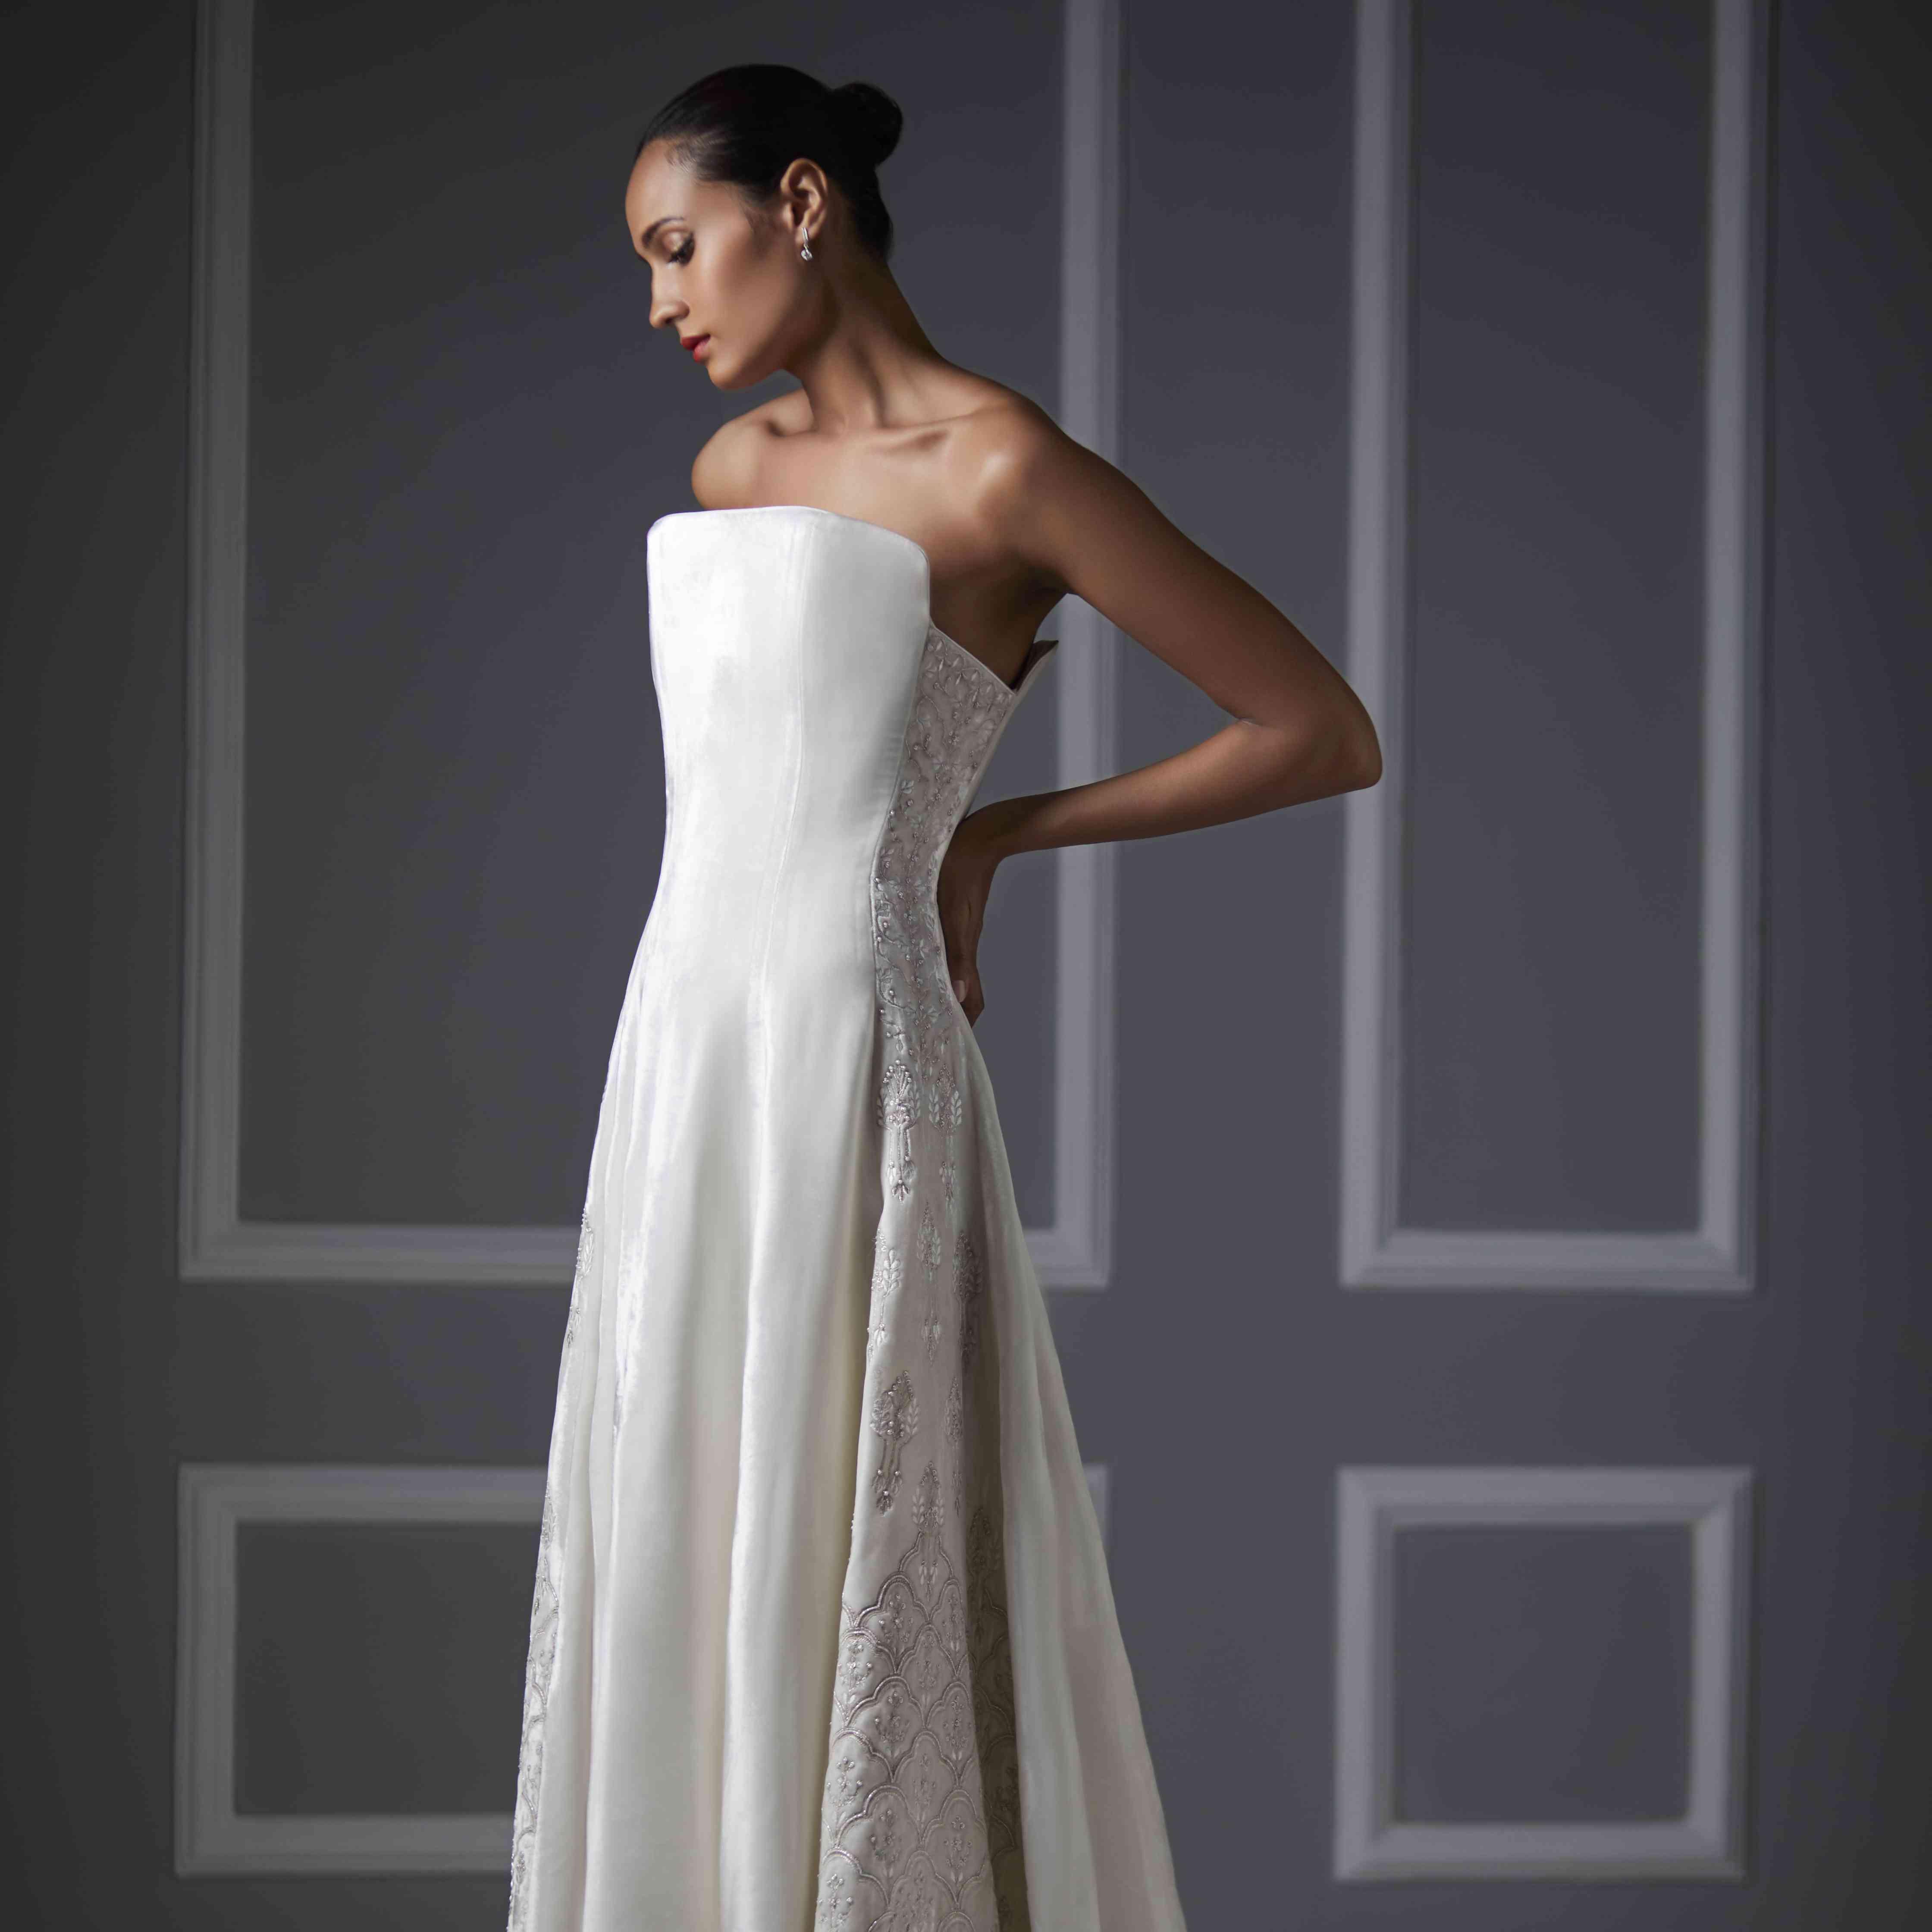 Western Wedding Dresses.Indian Designer Anita Dongre Debuts Her First Ever Western